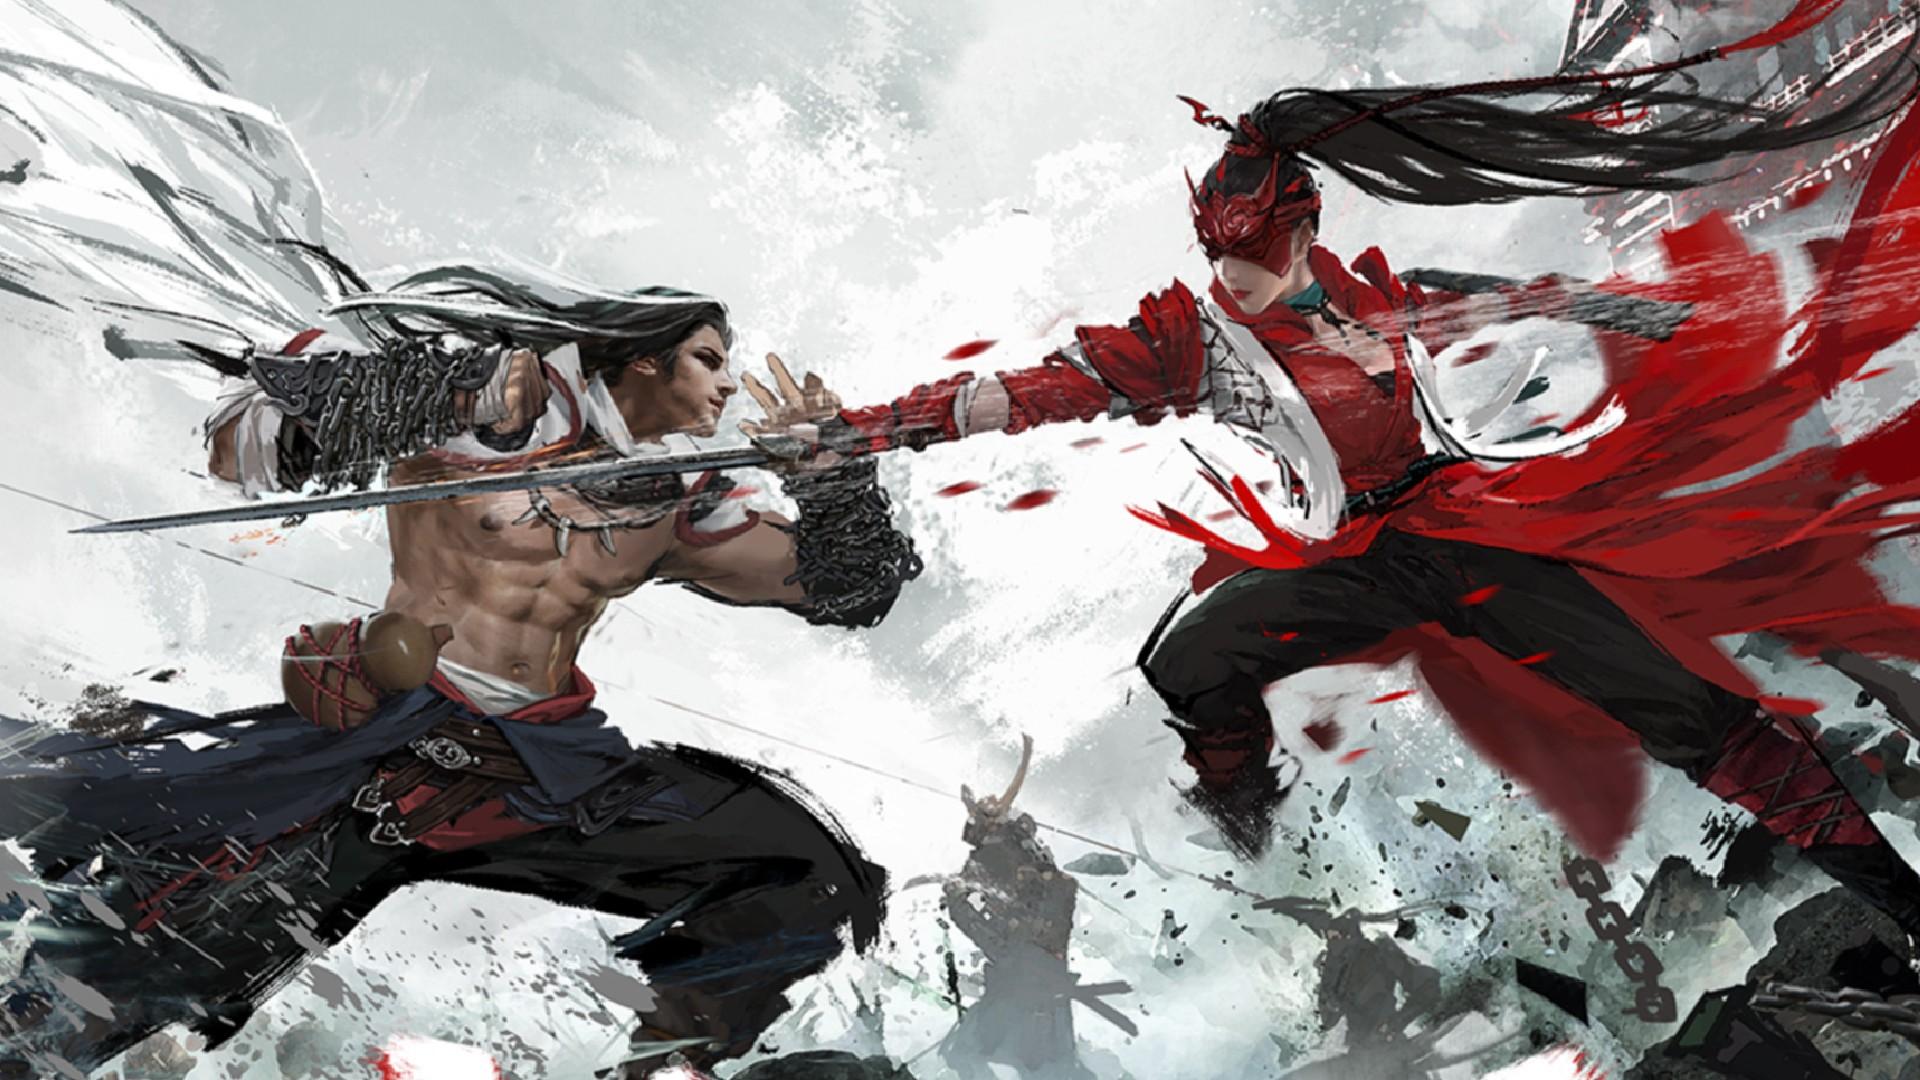 naraka-bladepoint-characters-best-1